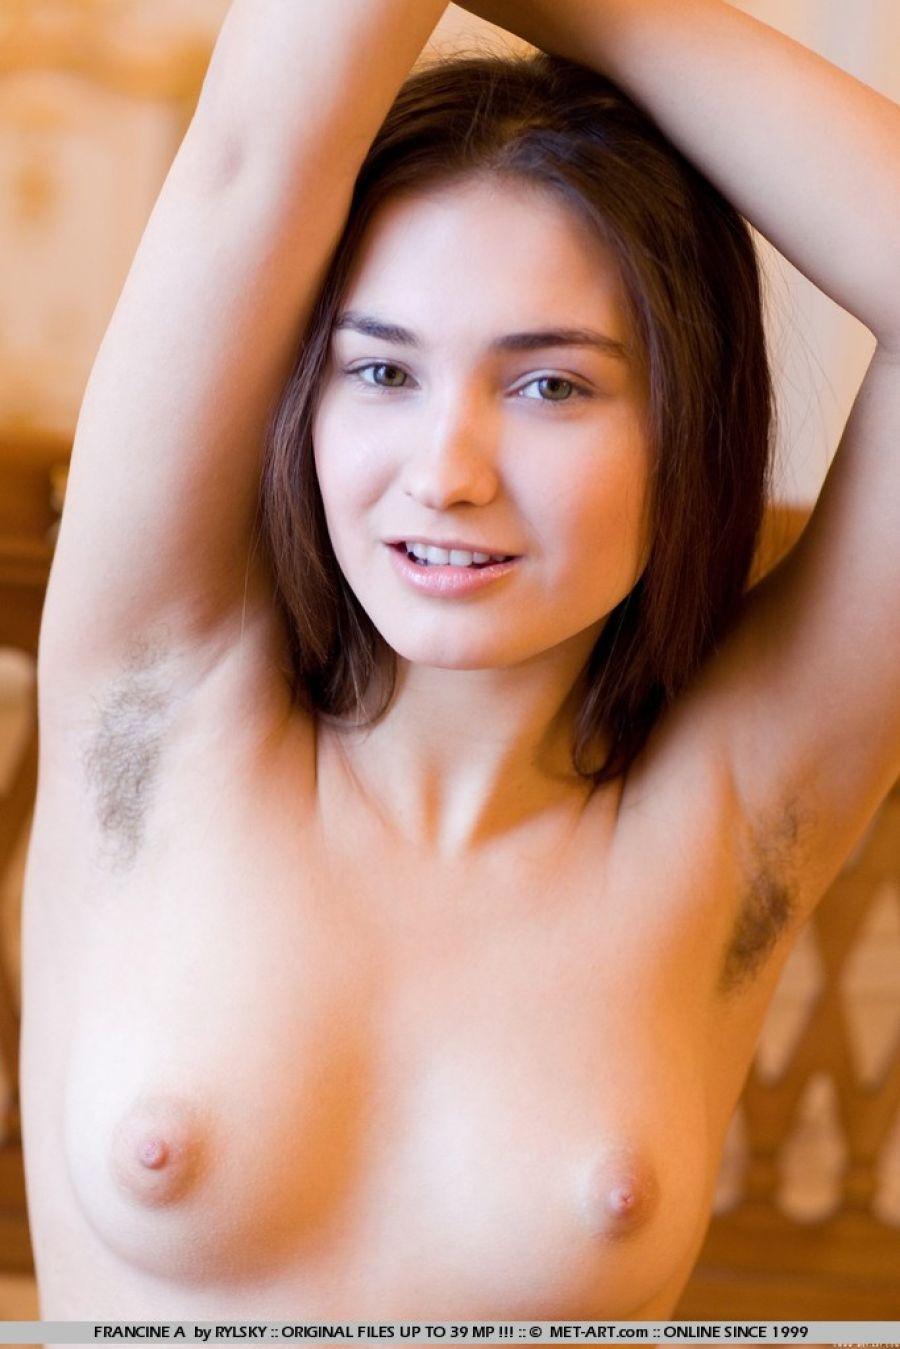 Met art hairy armpits nudes